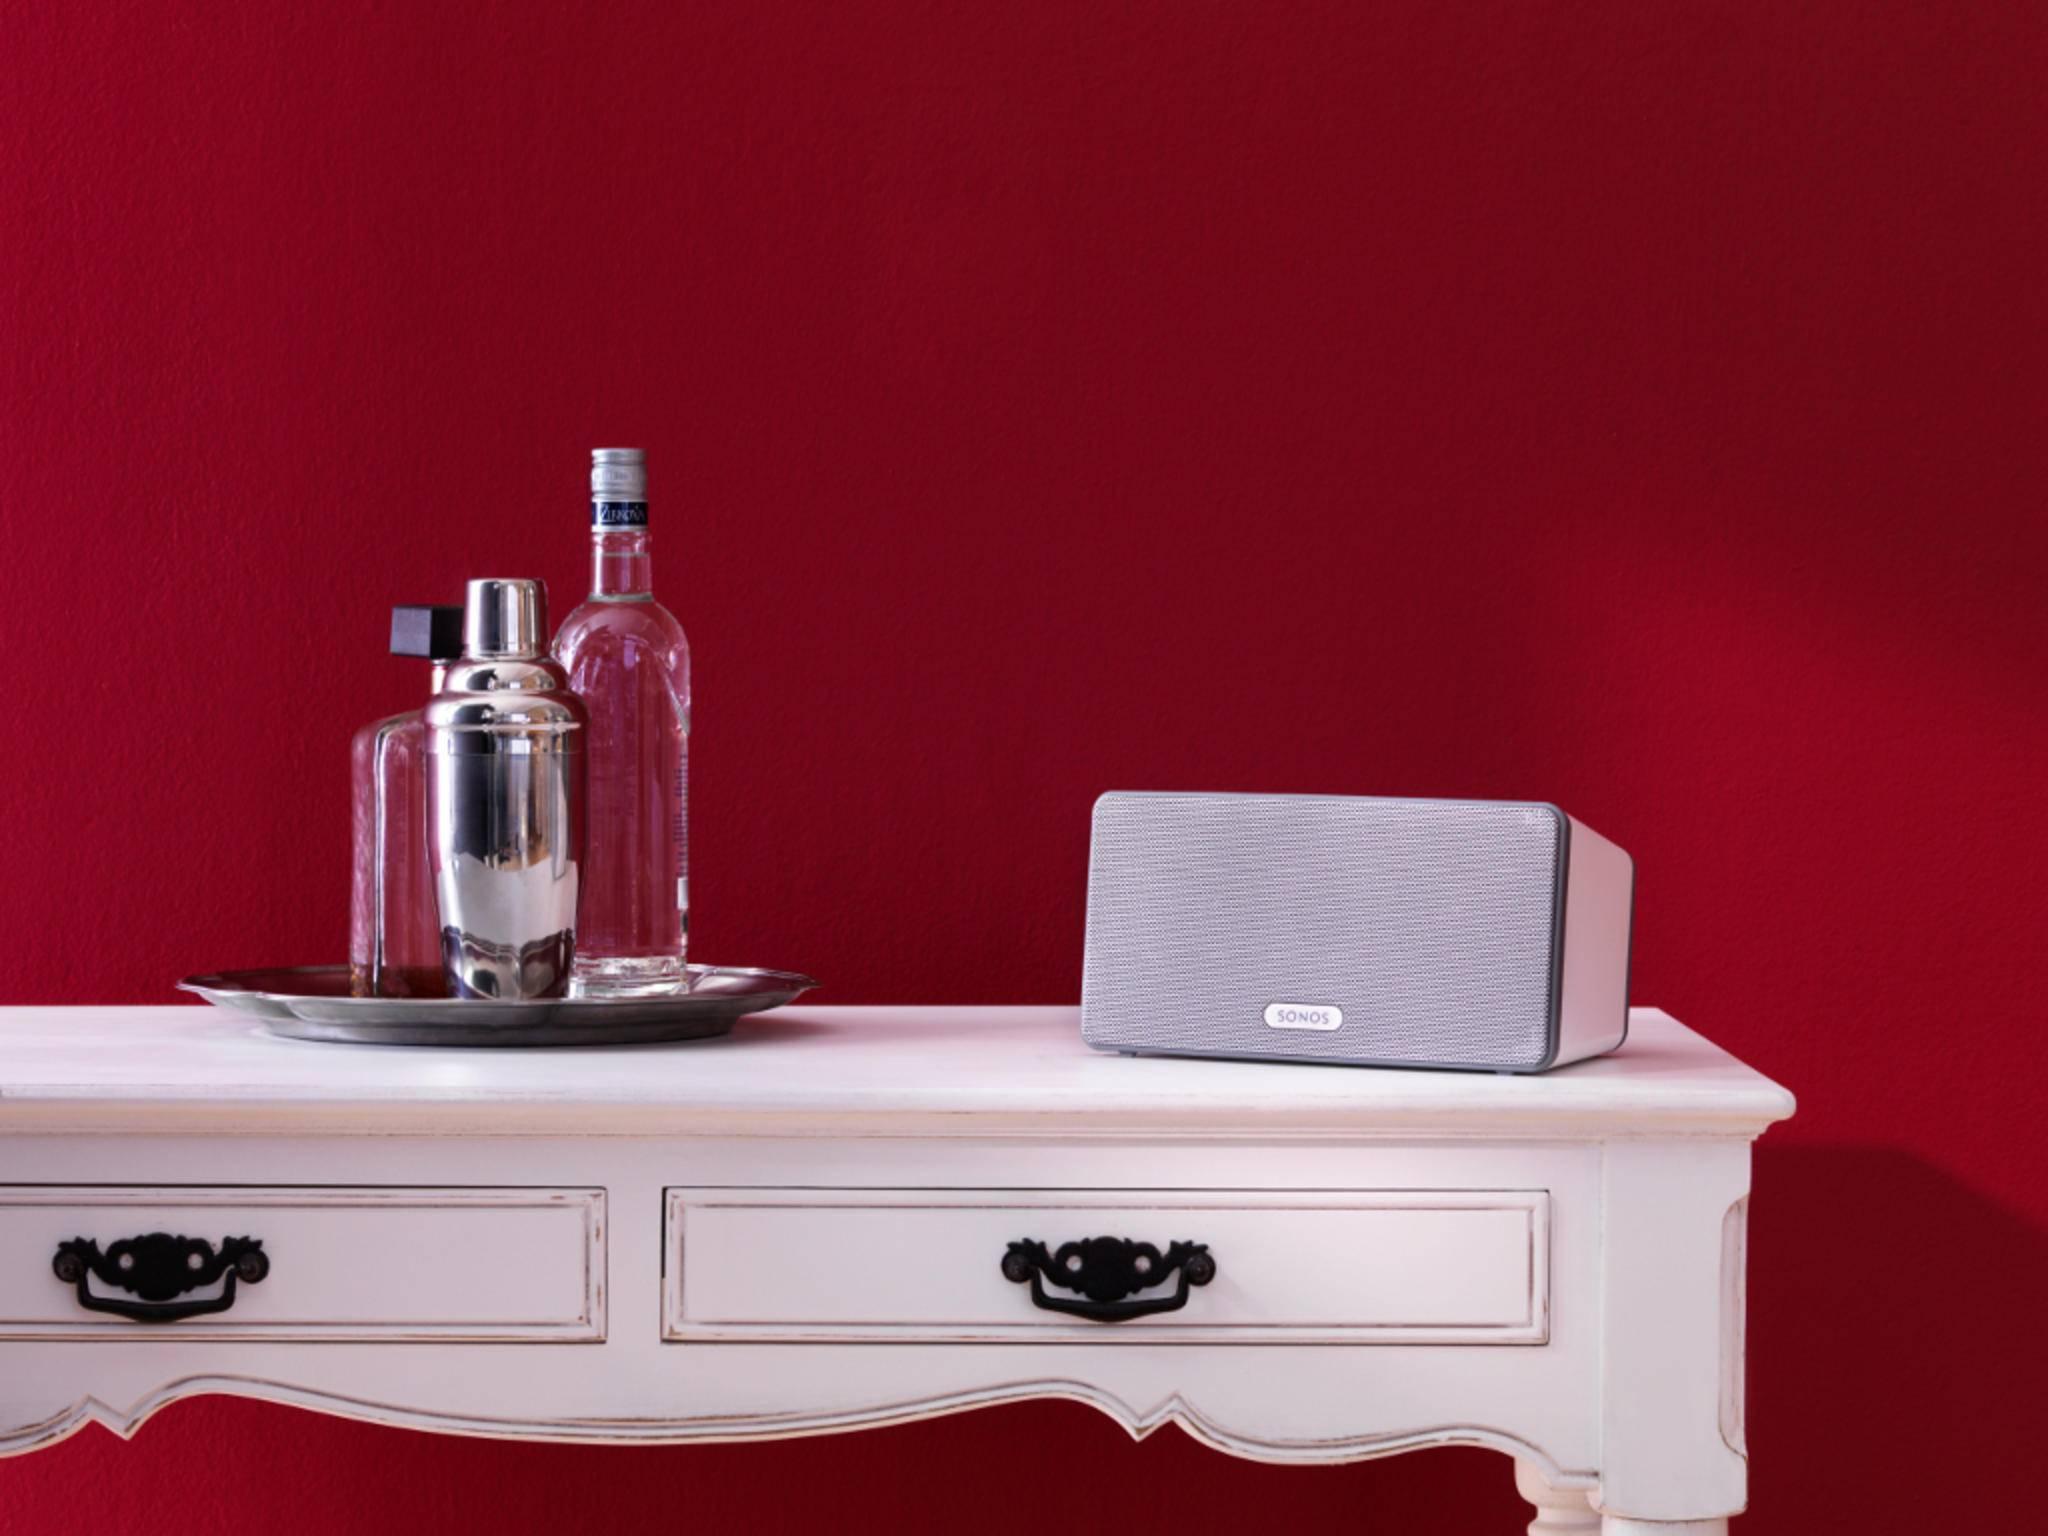 wo du am besten deinen wlan router platzierst. Black Bedroom Furniture Sets. Home Design Ideas